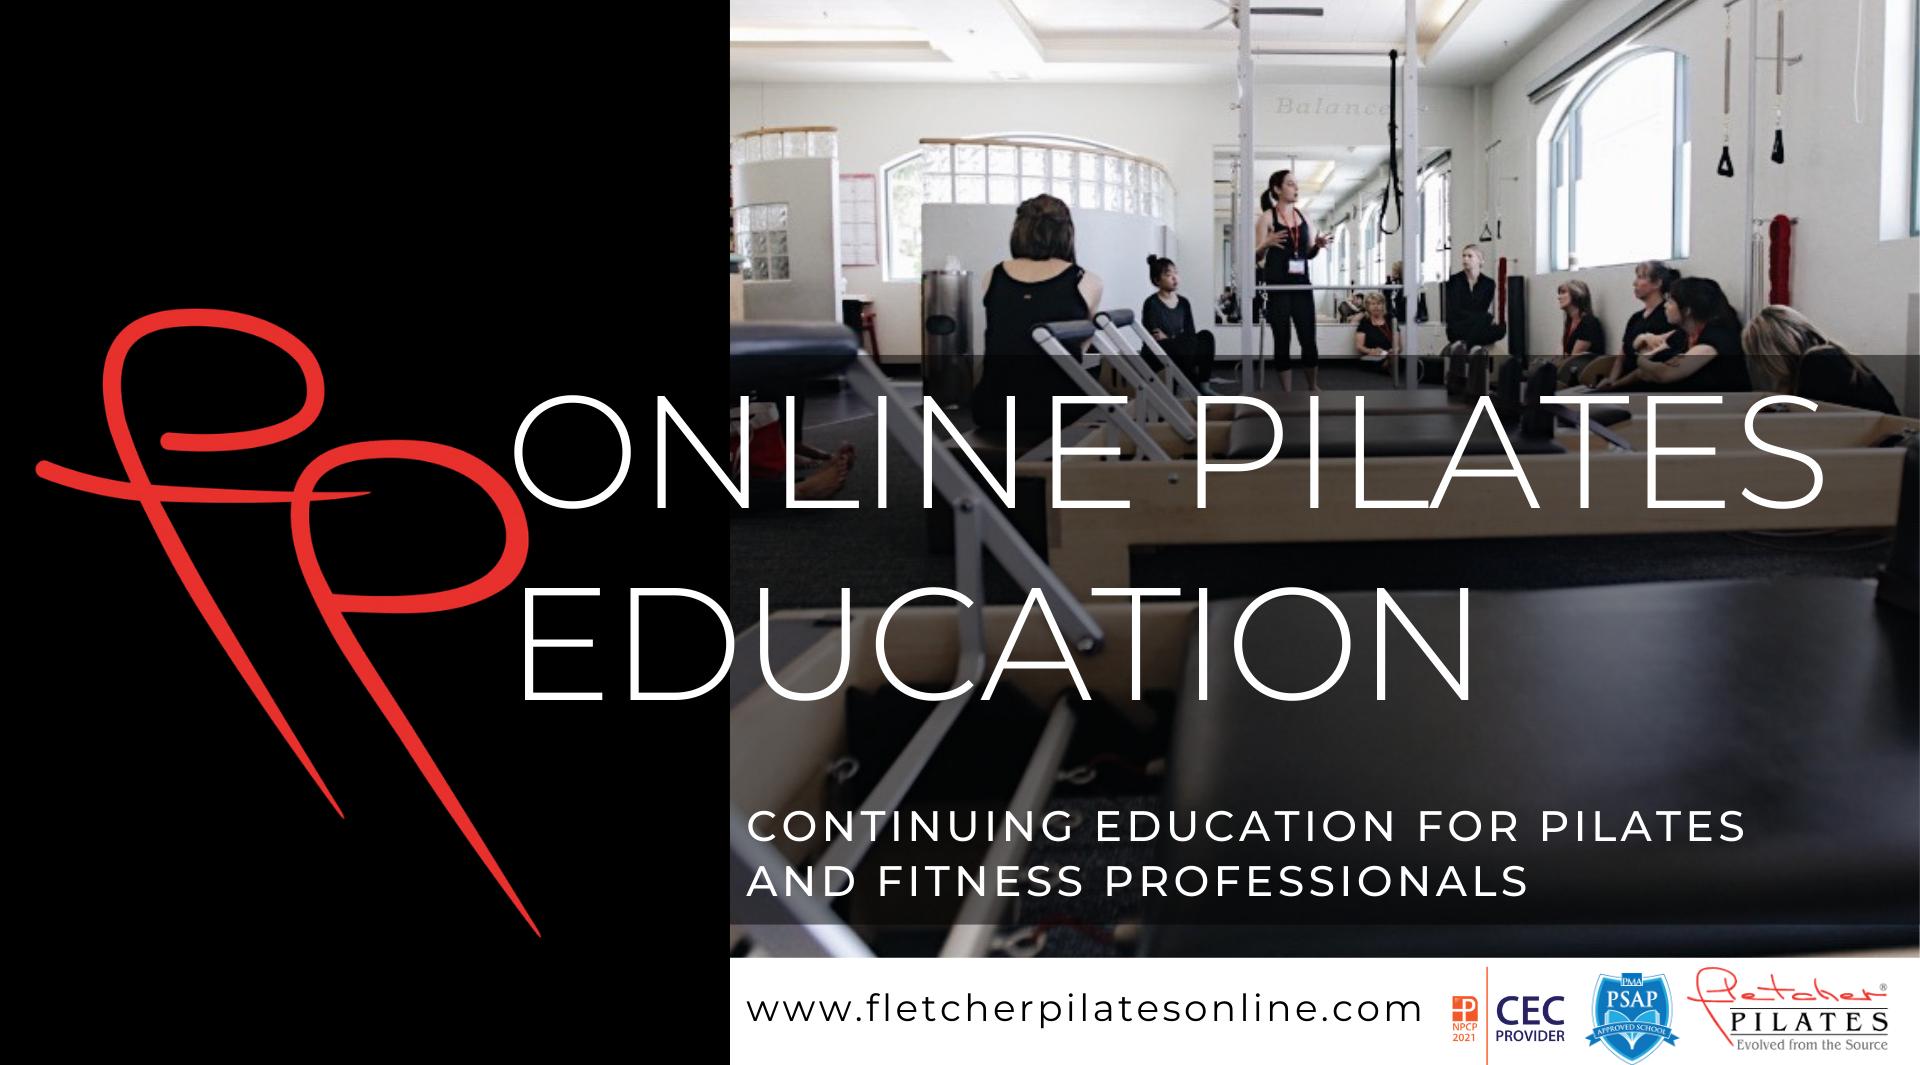 Fletcher Pilates Online Pilates Education